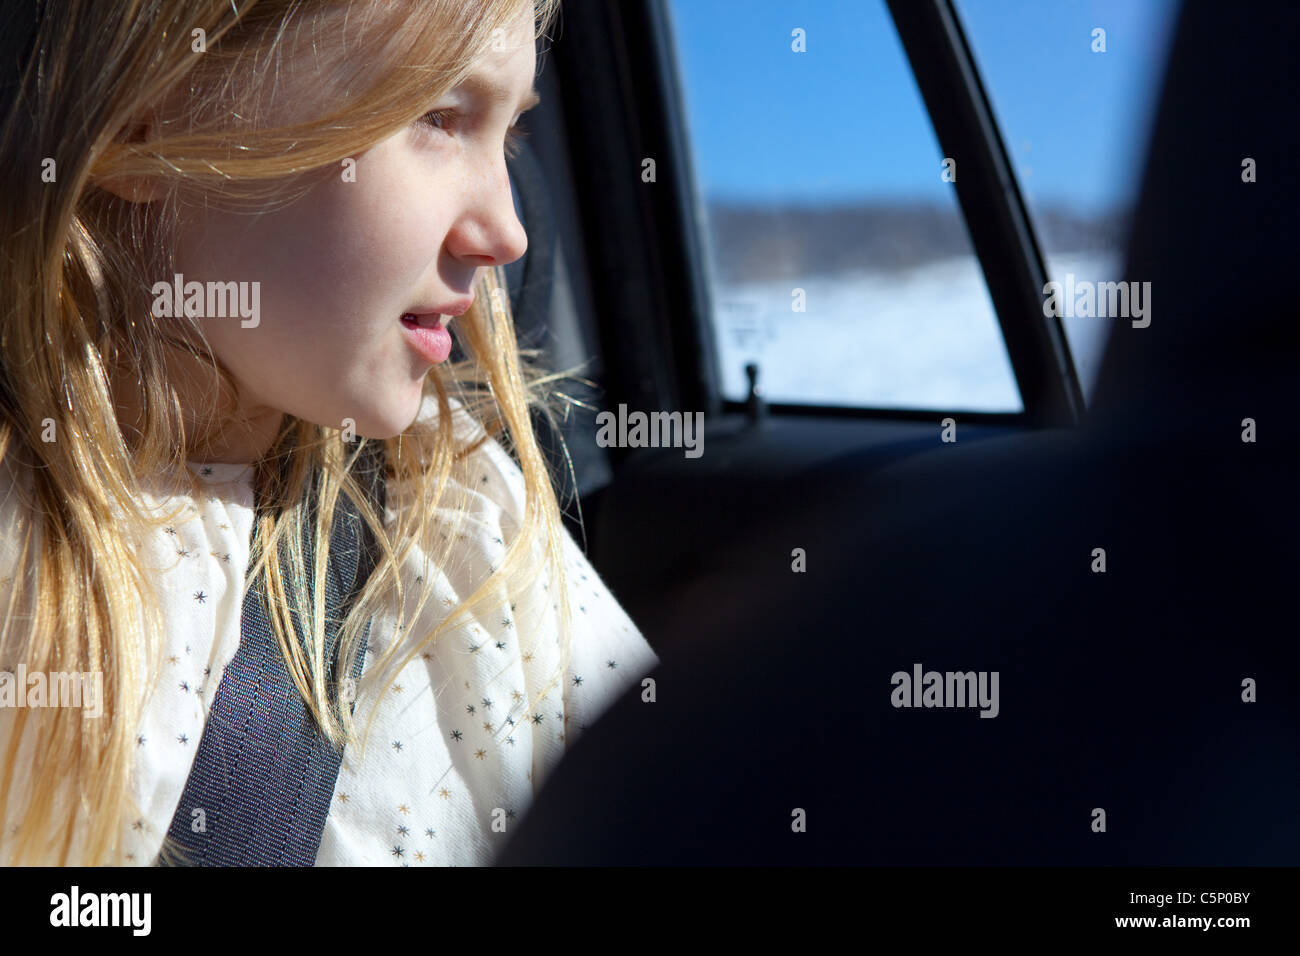 Joven mirando a través de la ventana de coche Imagen De Stock